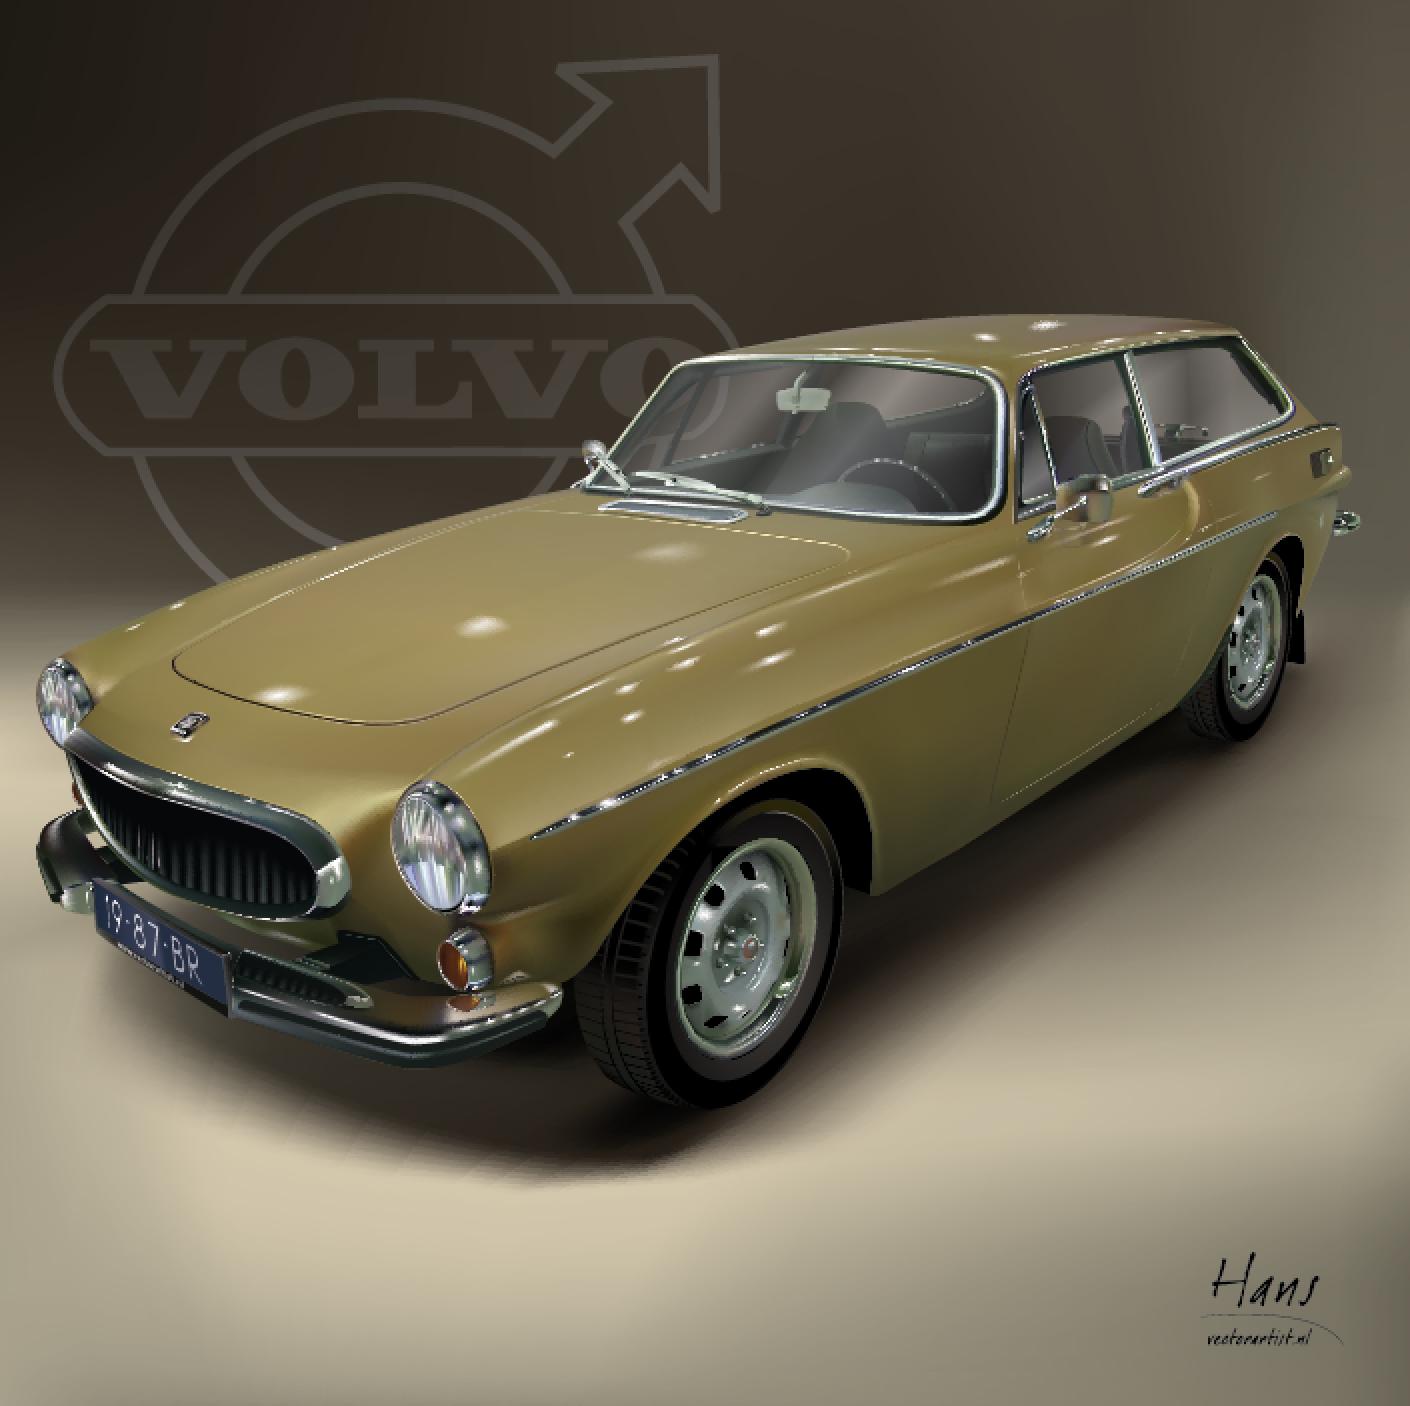 Classic Sports Cars, Volvo, Volvo Cars